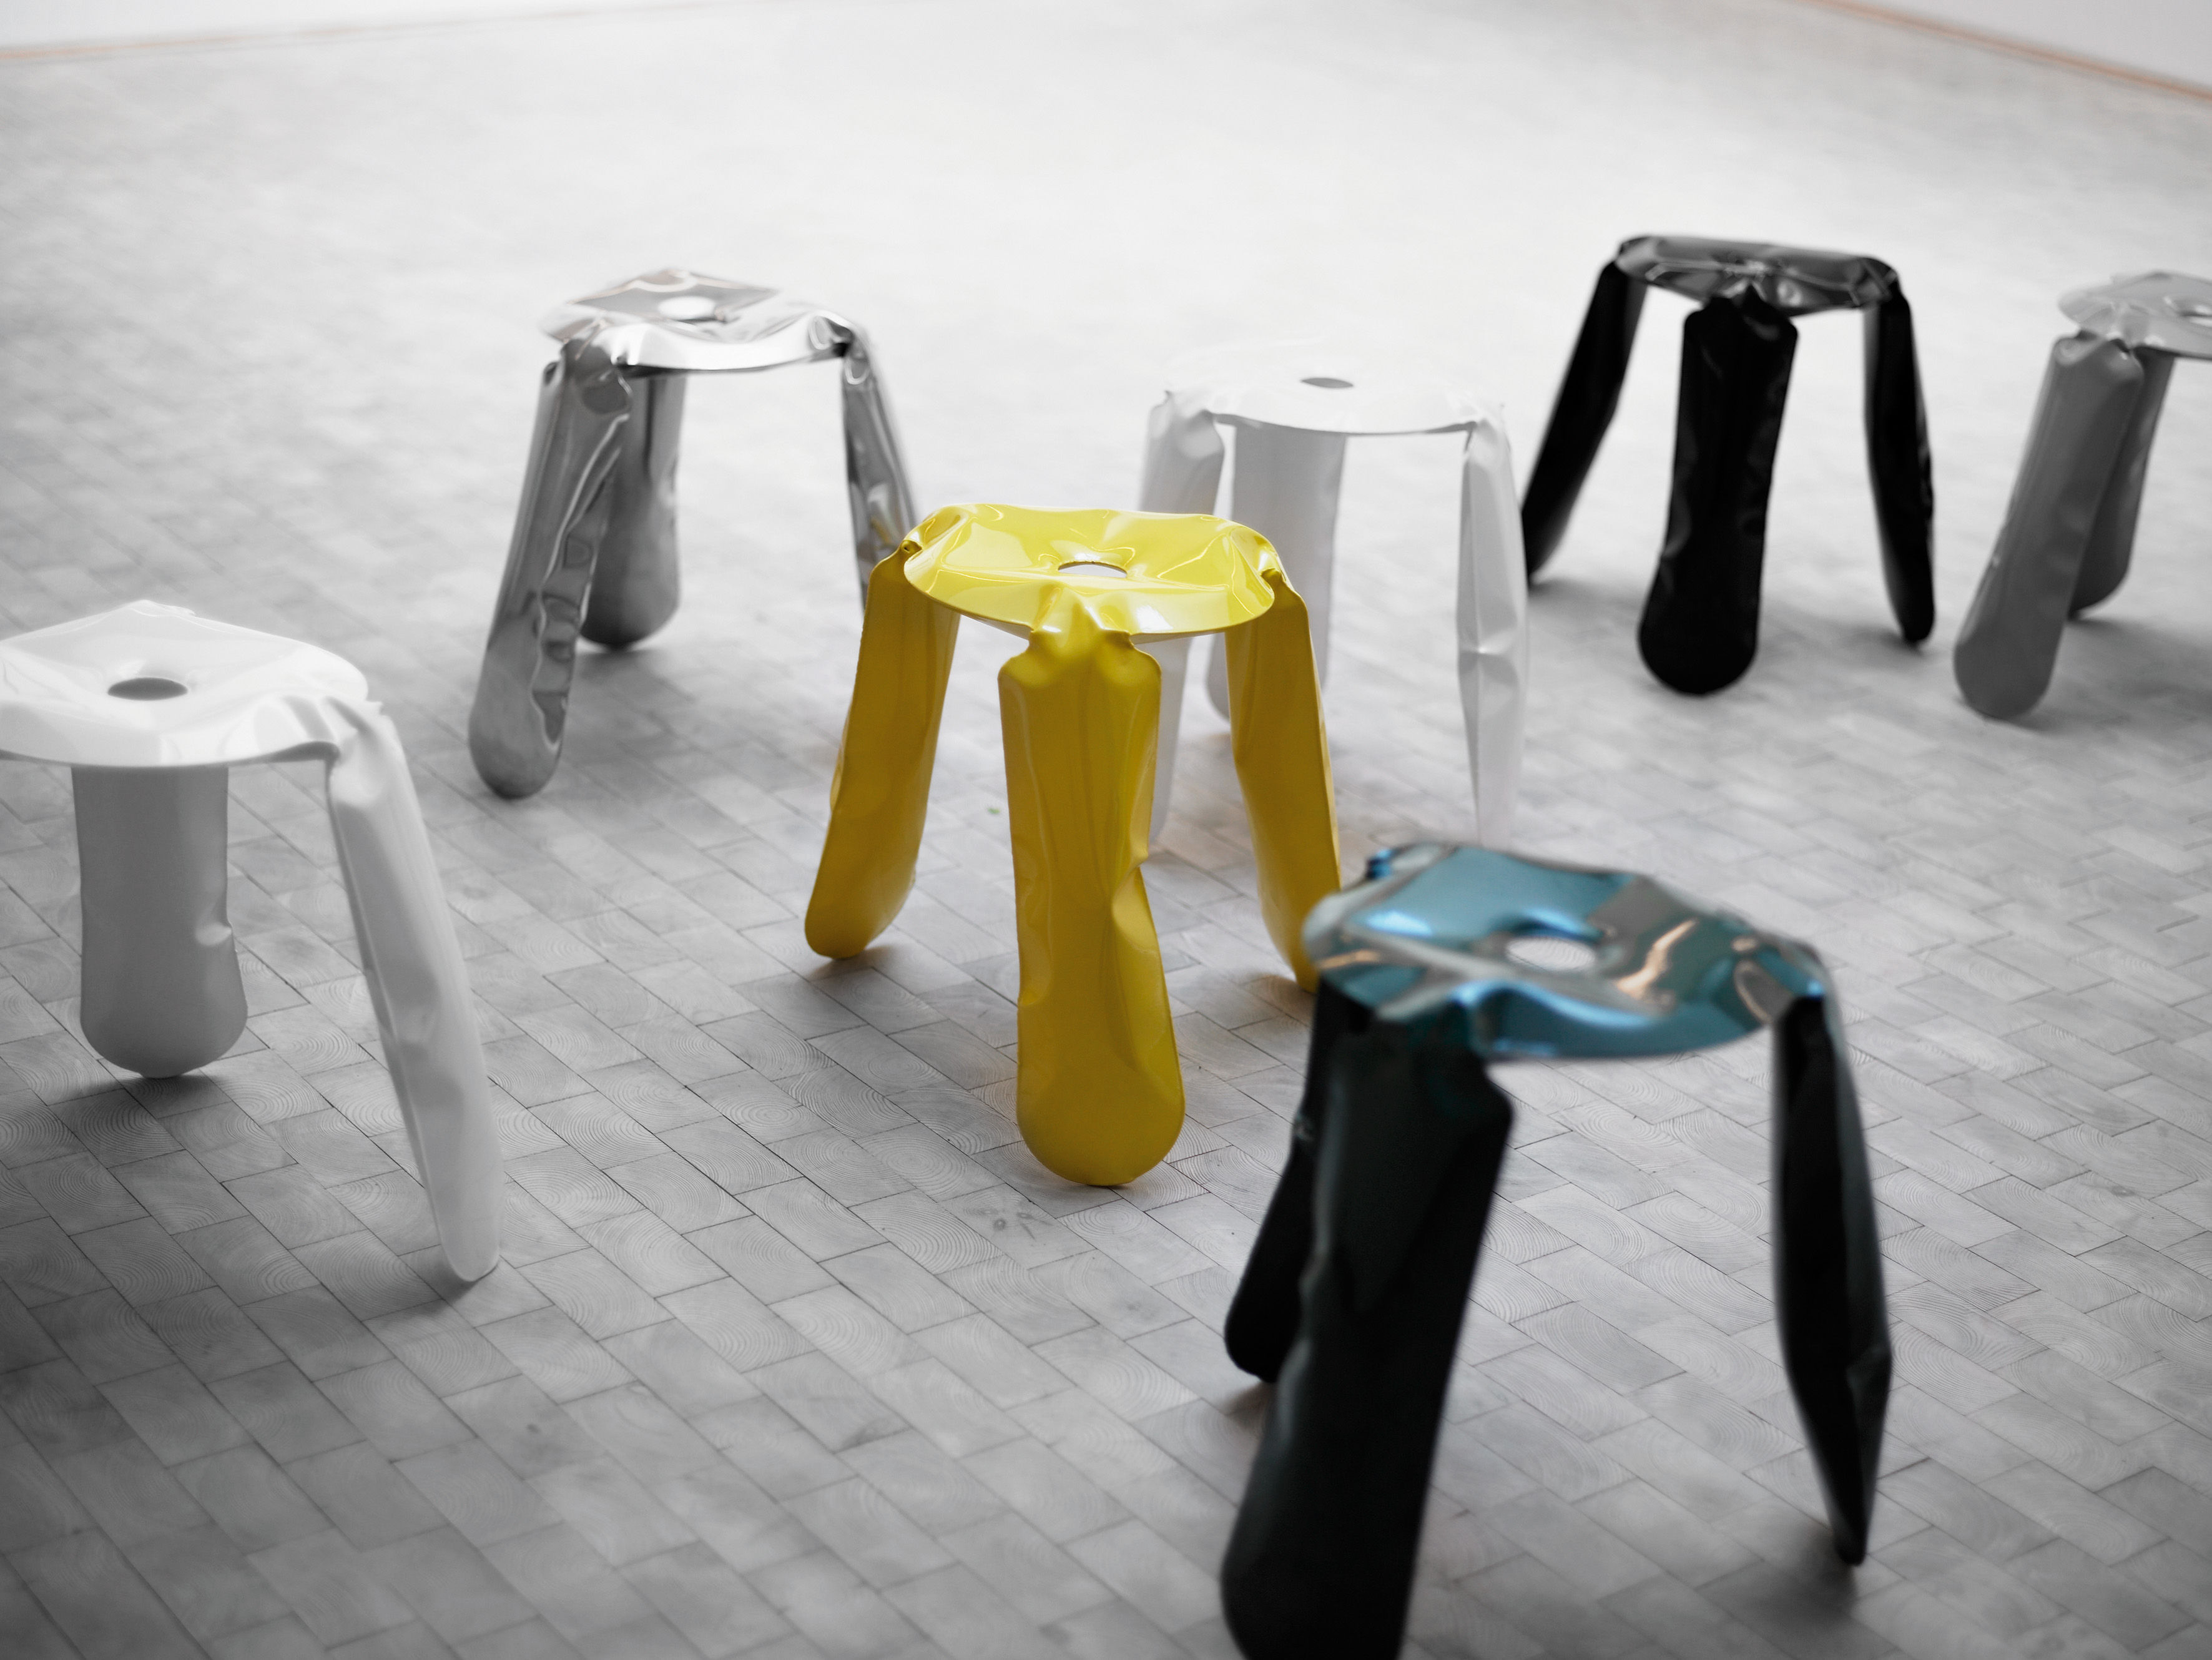 Plopp mini sgabello bimbi h 35 cm giallo by zieta made in design